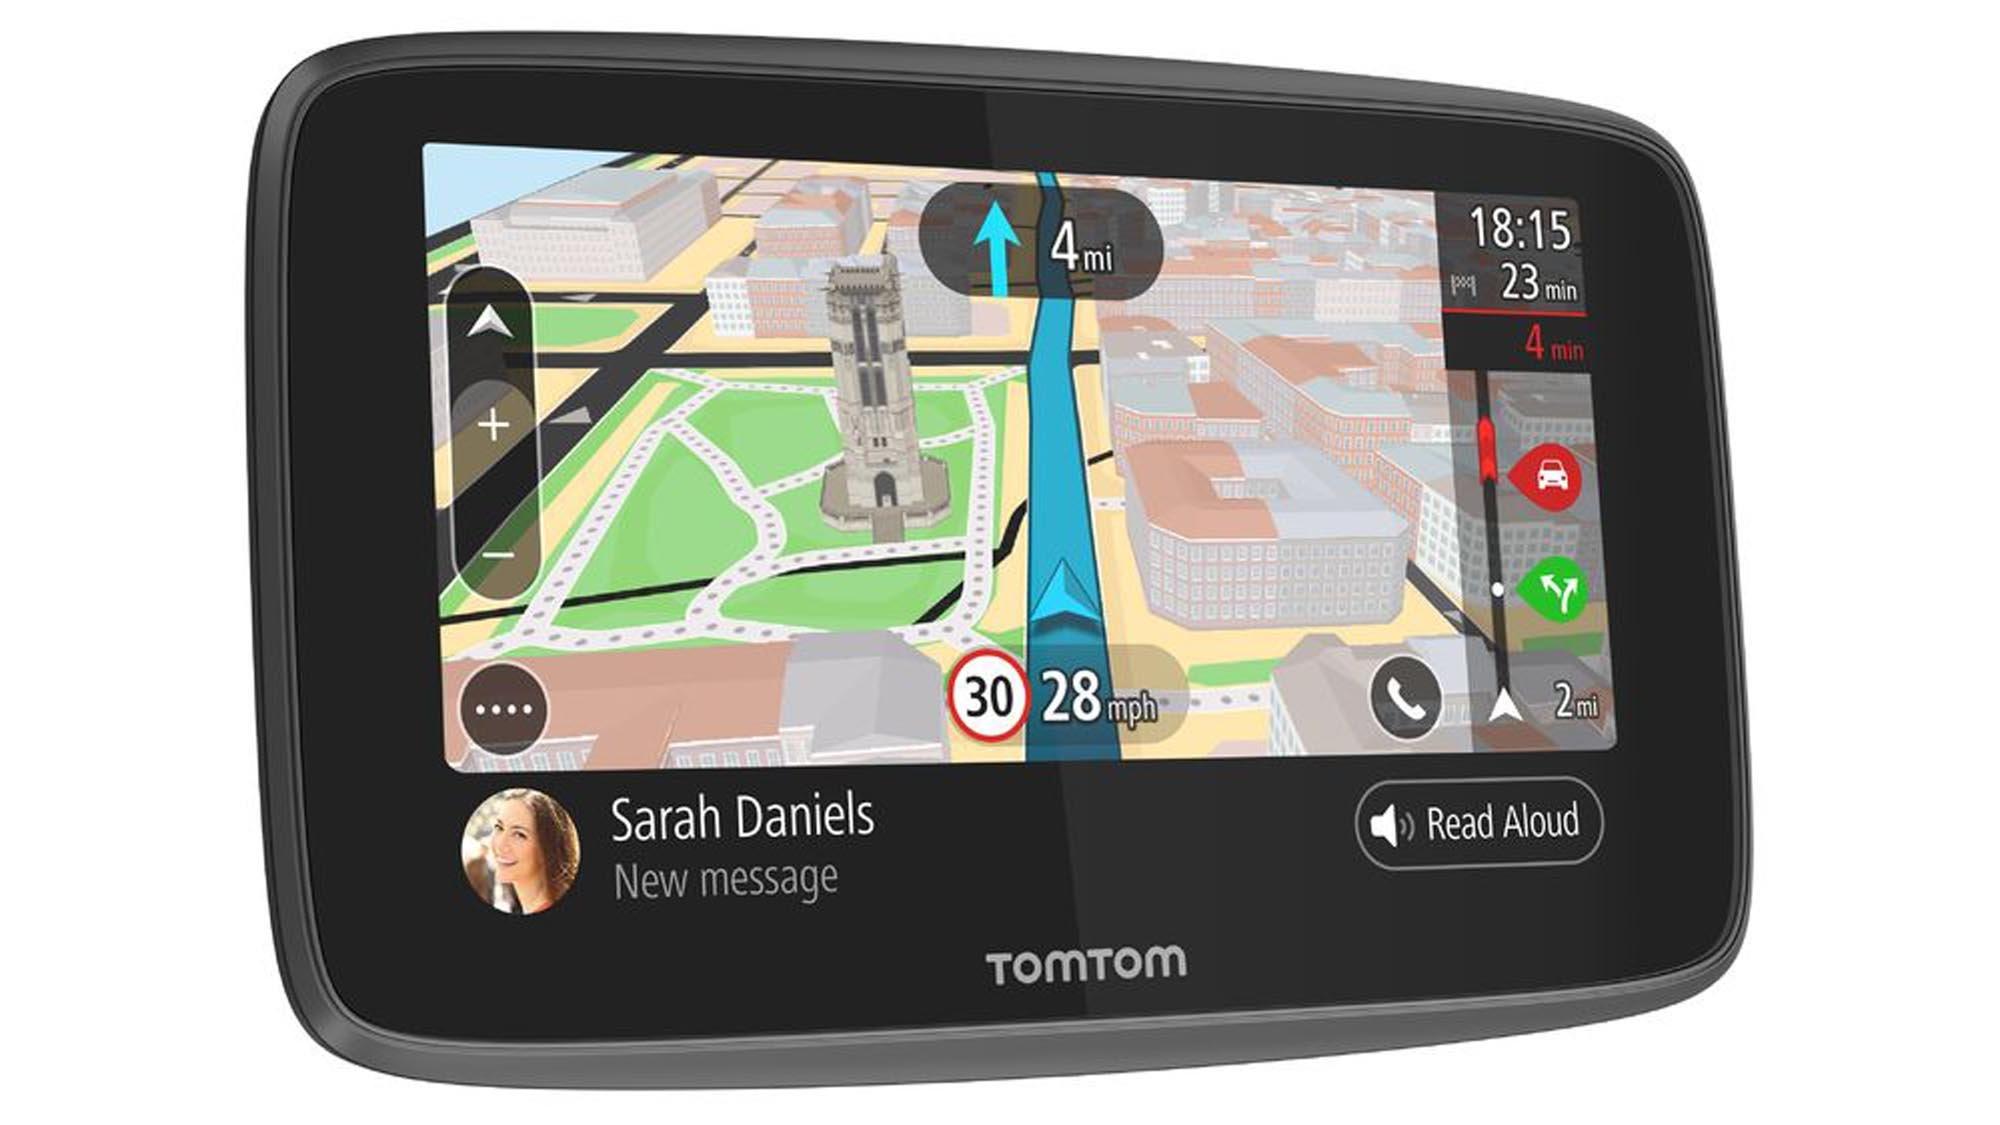 Tomtom Tracker Wiring Diagram